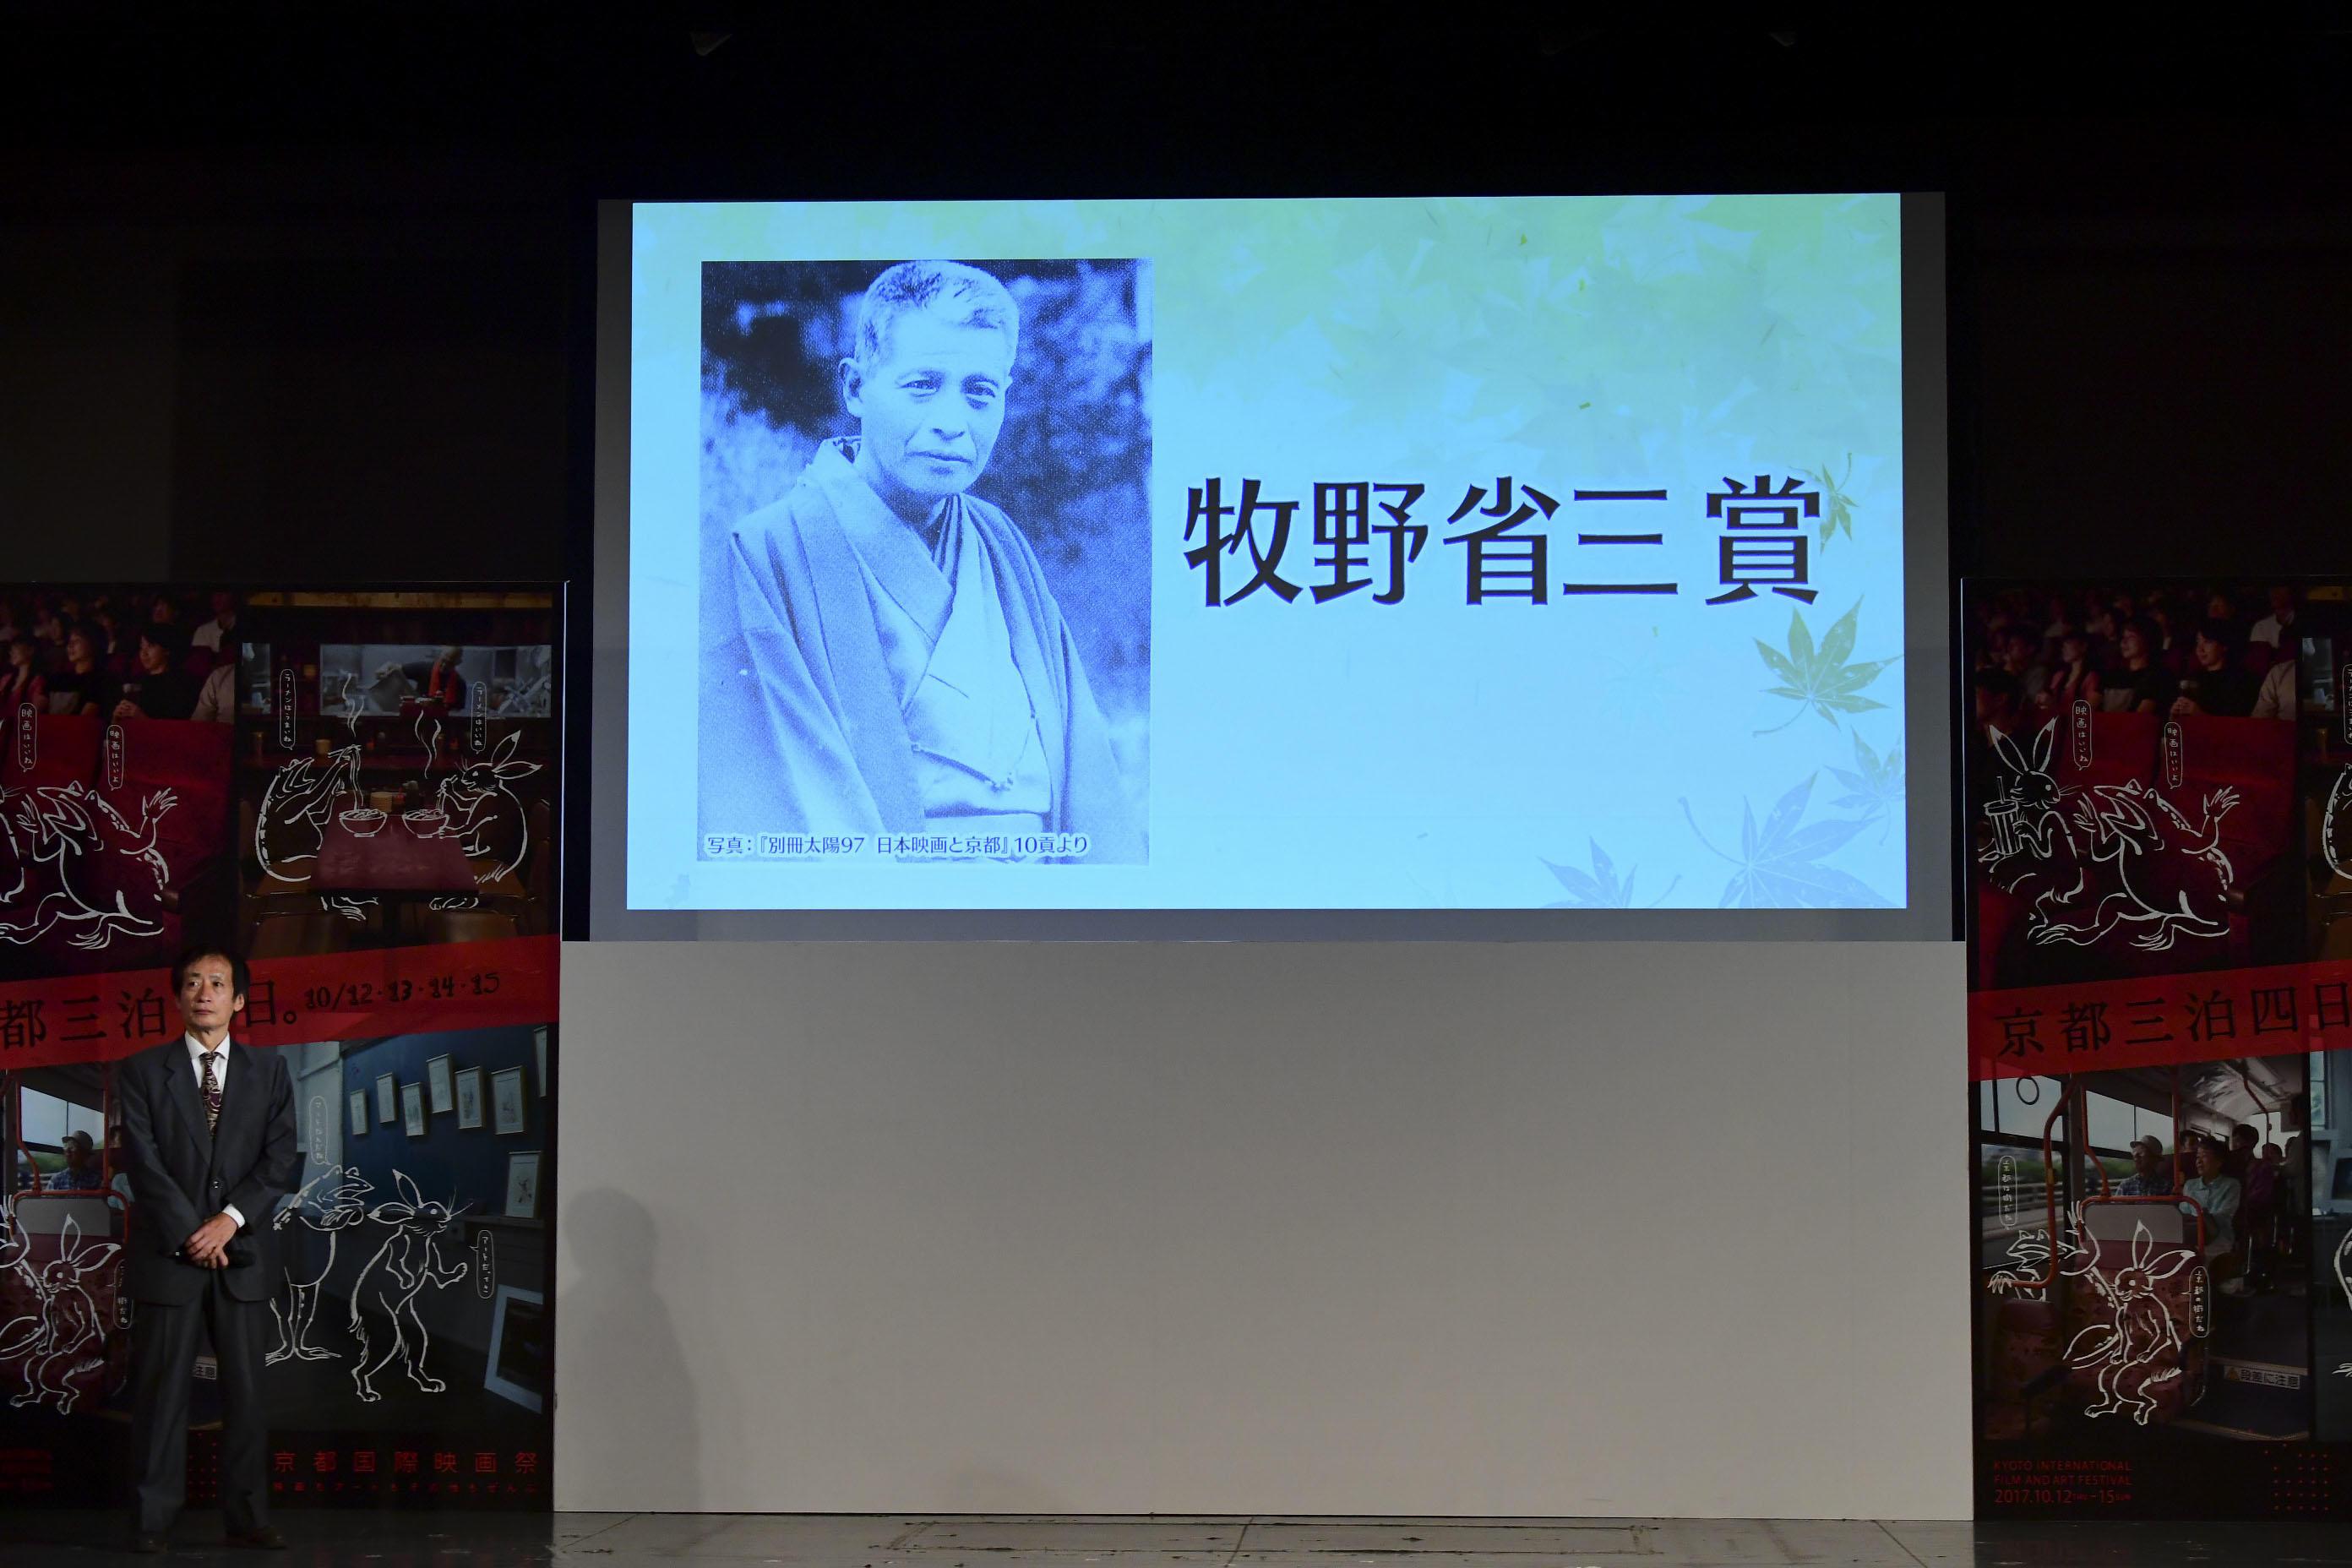 http://news.yoshimoto.co.jp/20170907002441-054eb76b2e2c0bde3f6b7684afcfbf398a63918a.jpg